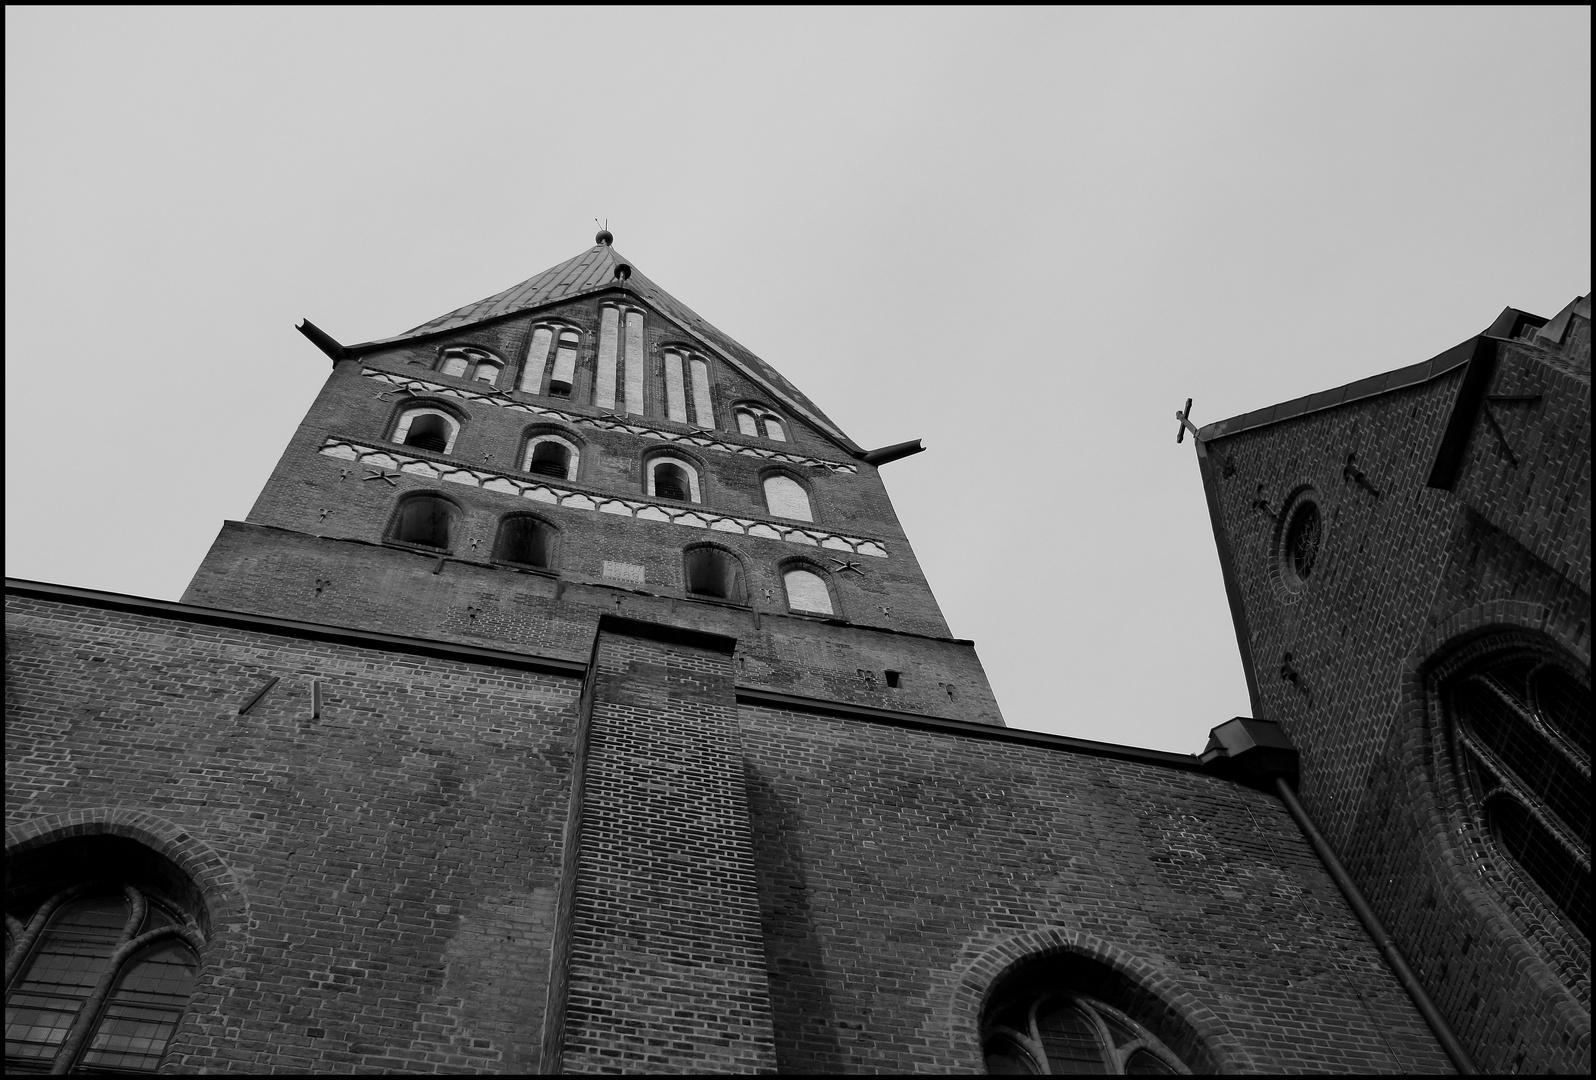 St. Johannis / Lüneburg